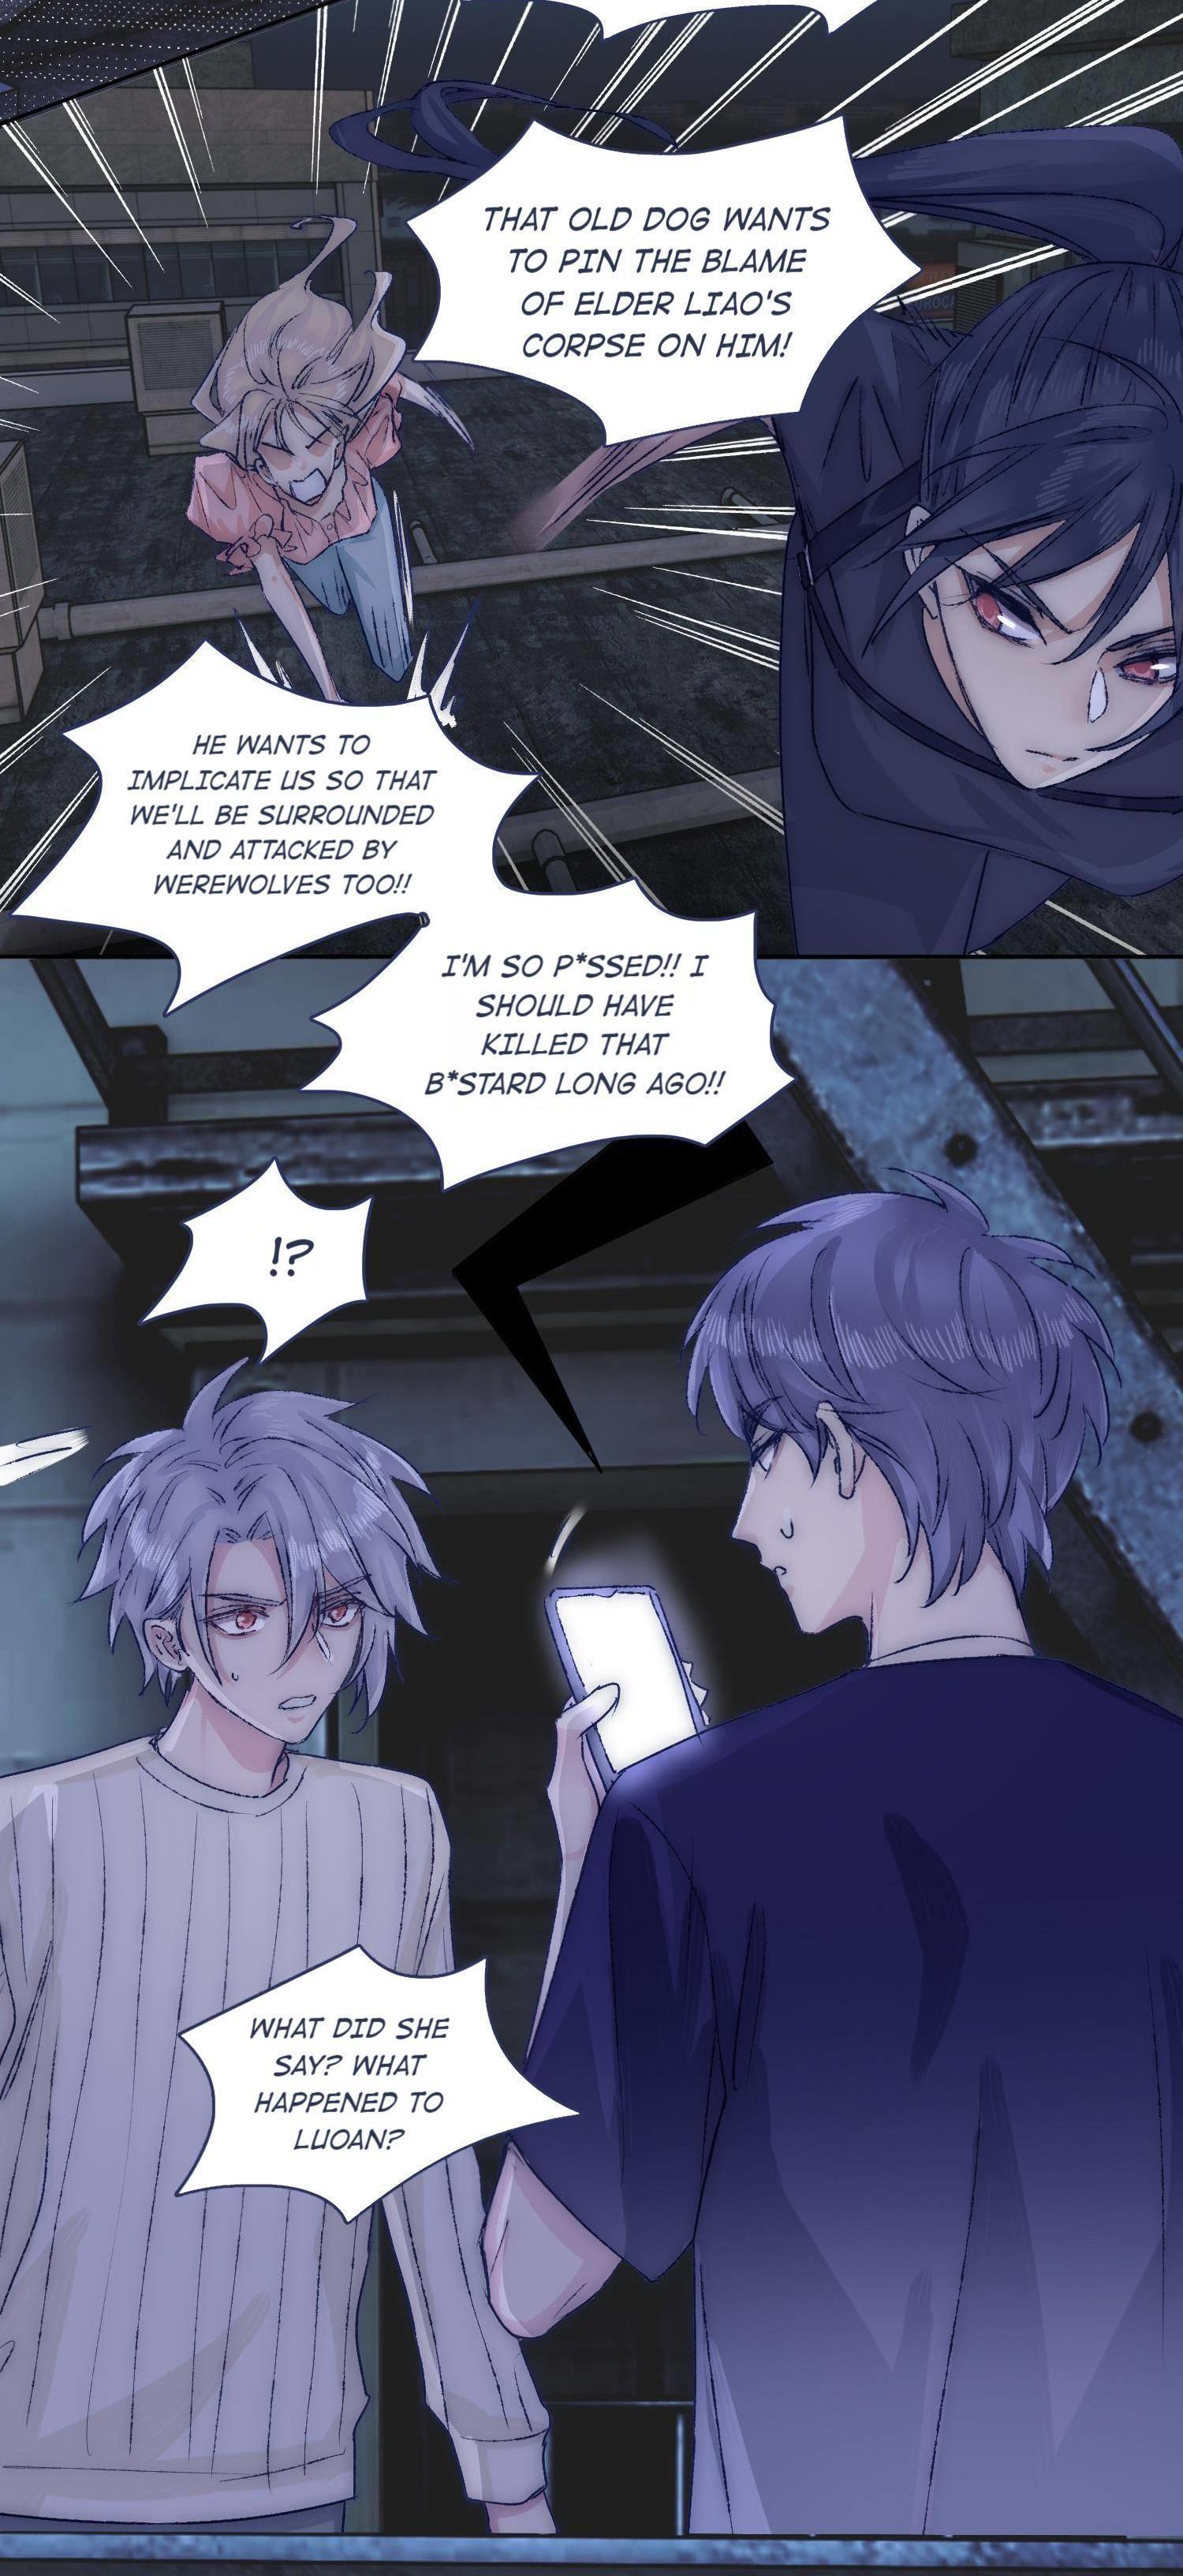 I Offer My Neck To You Chapter 72 page 27 - Mangakakalot